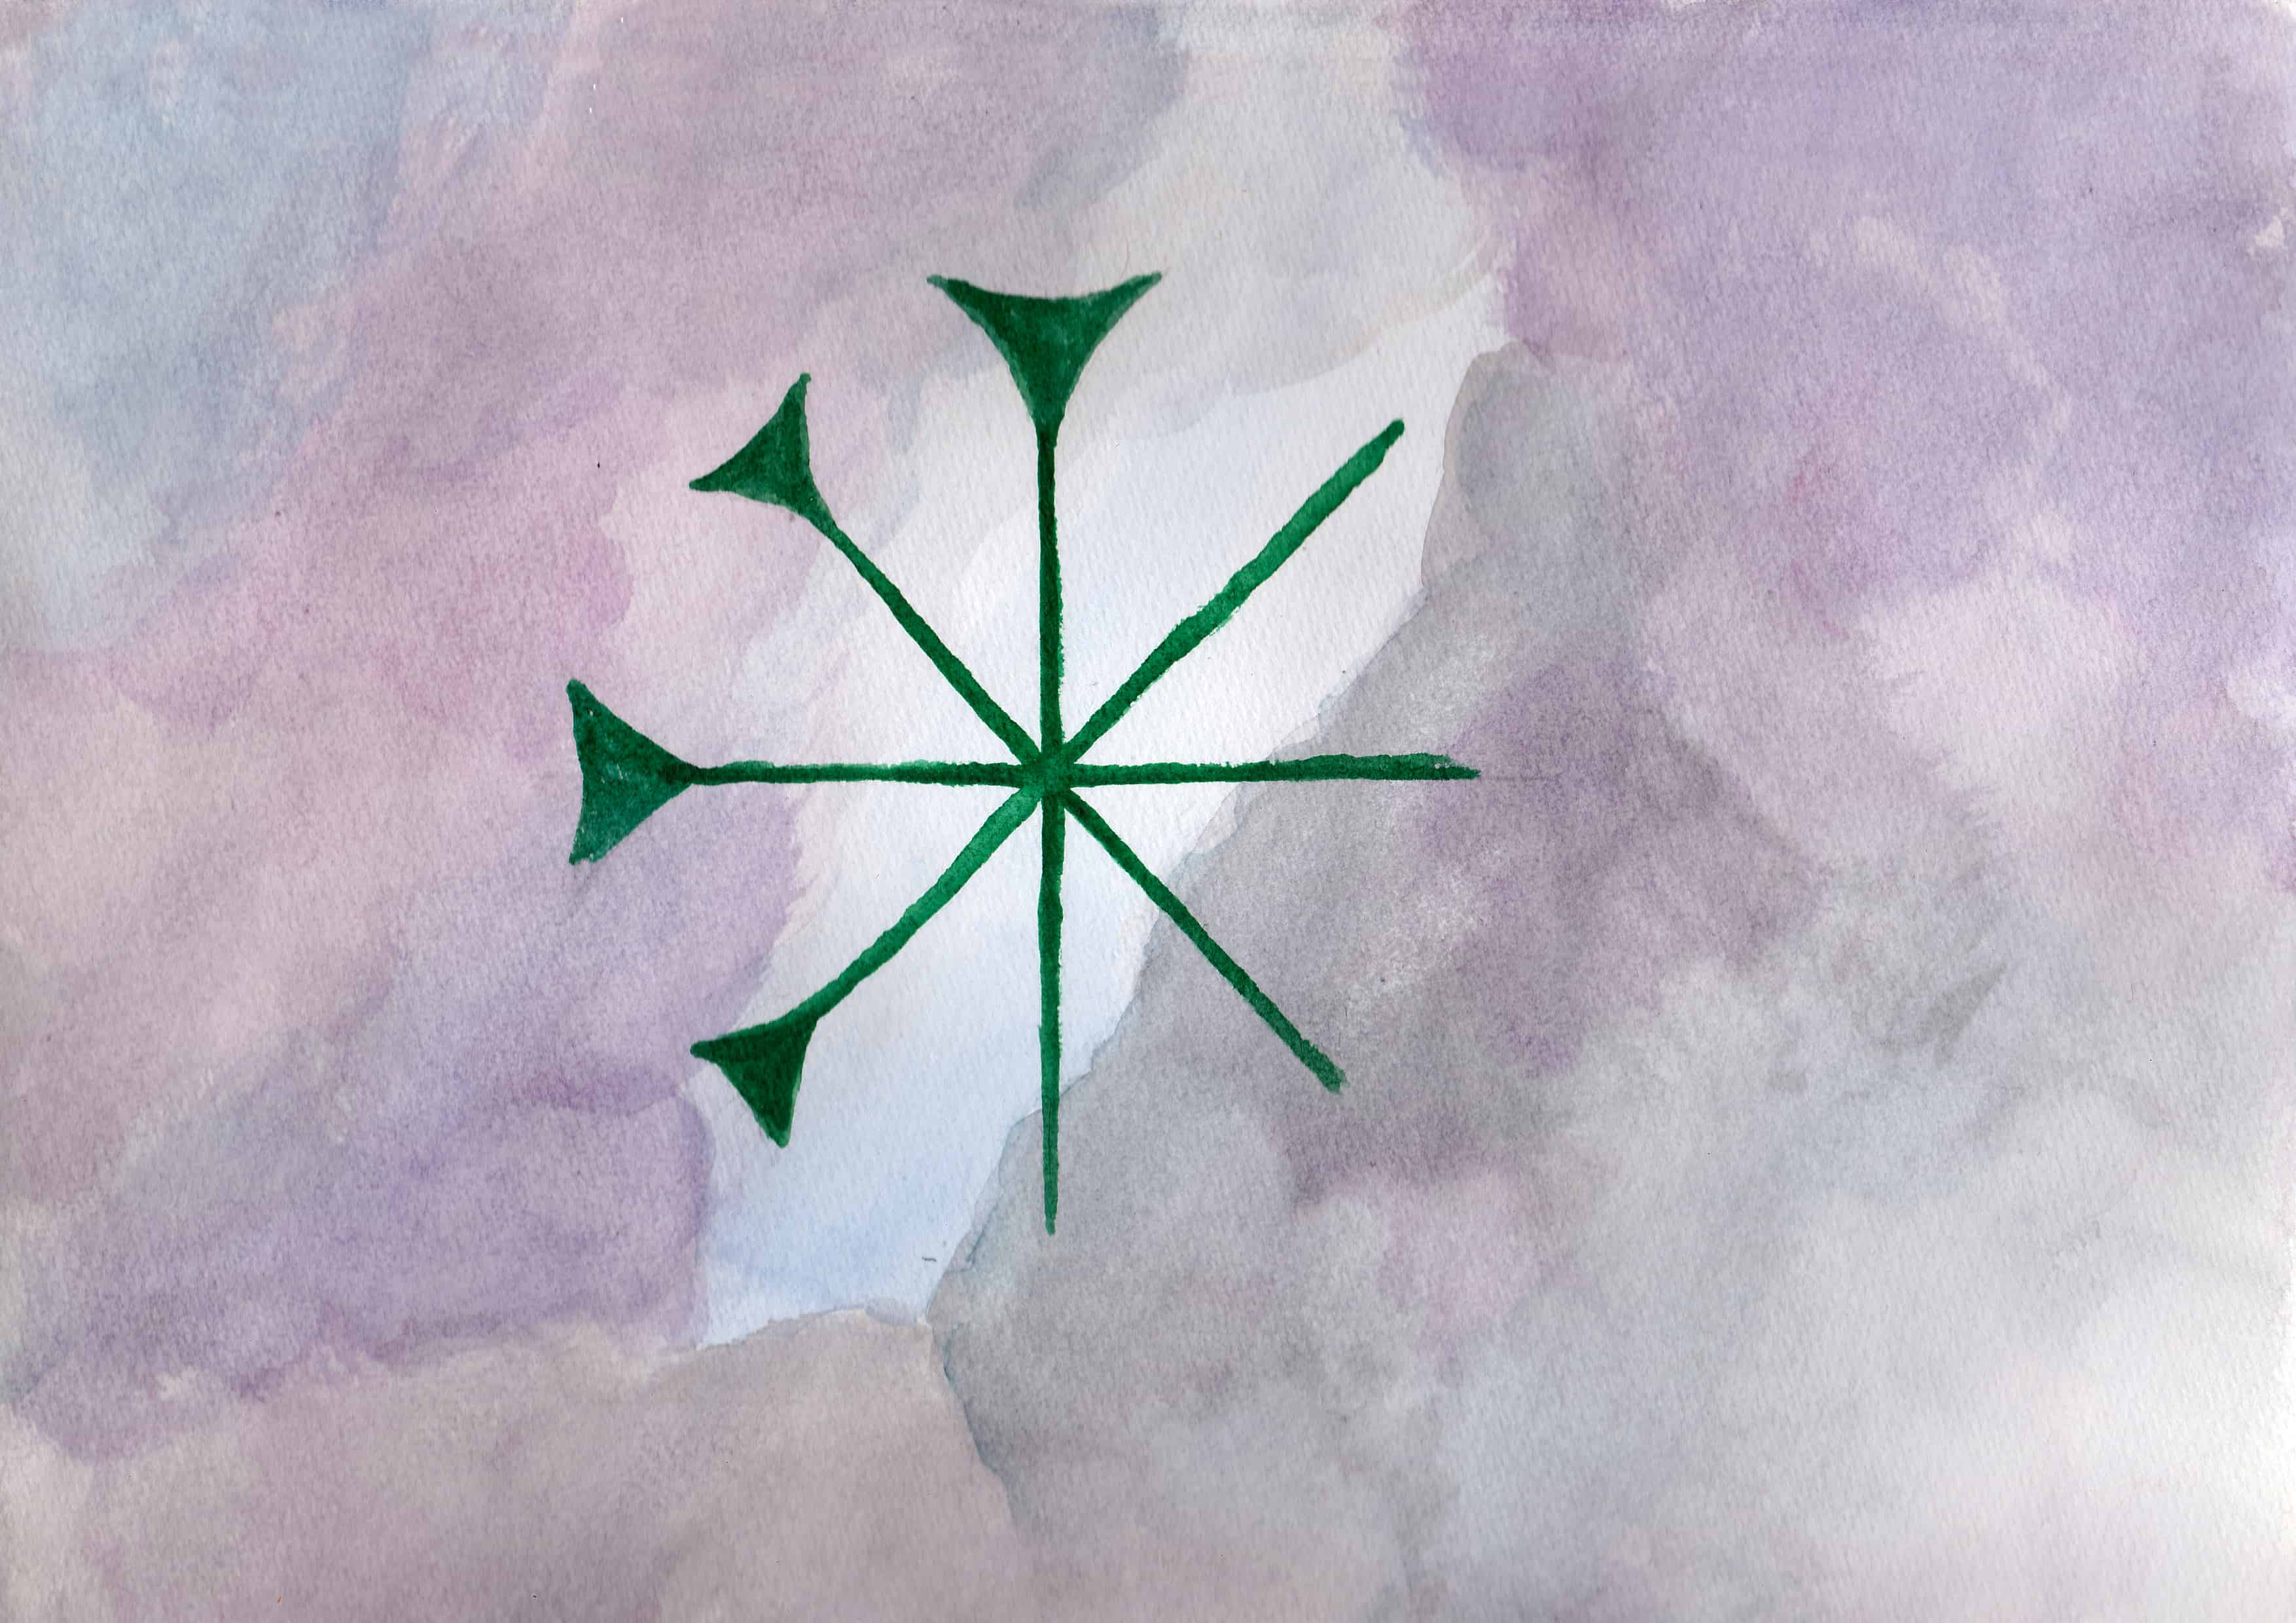 Anu Cuneiform - 100 Sacred Symbols in Watercolour by Linda Ursin